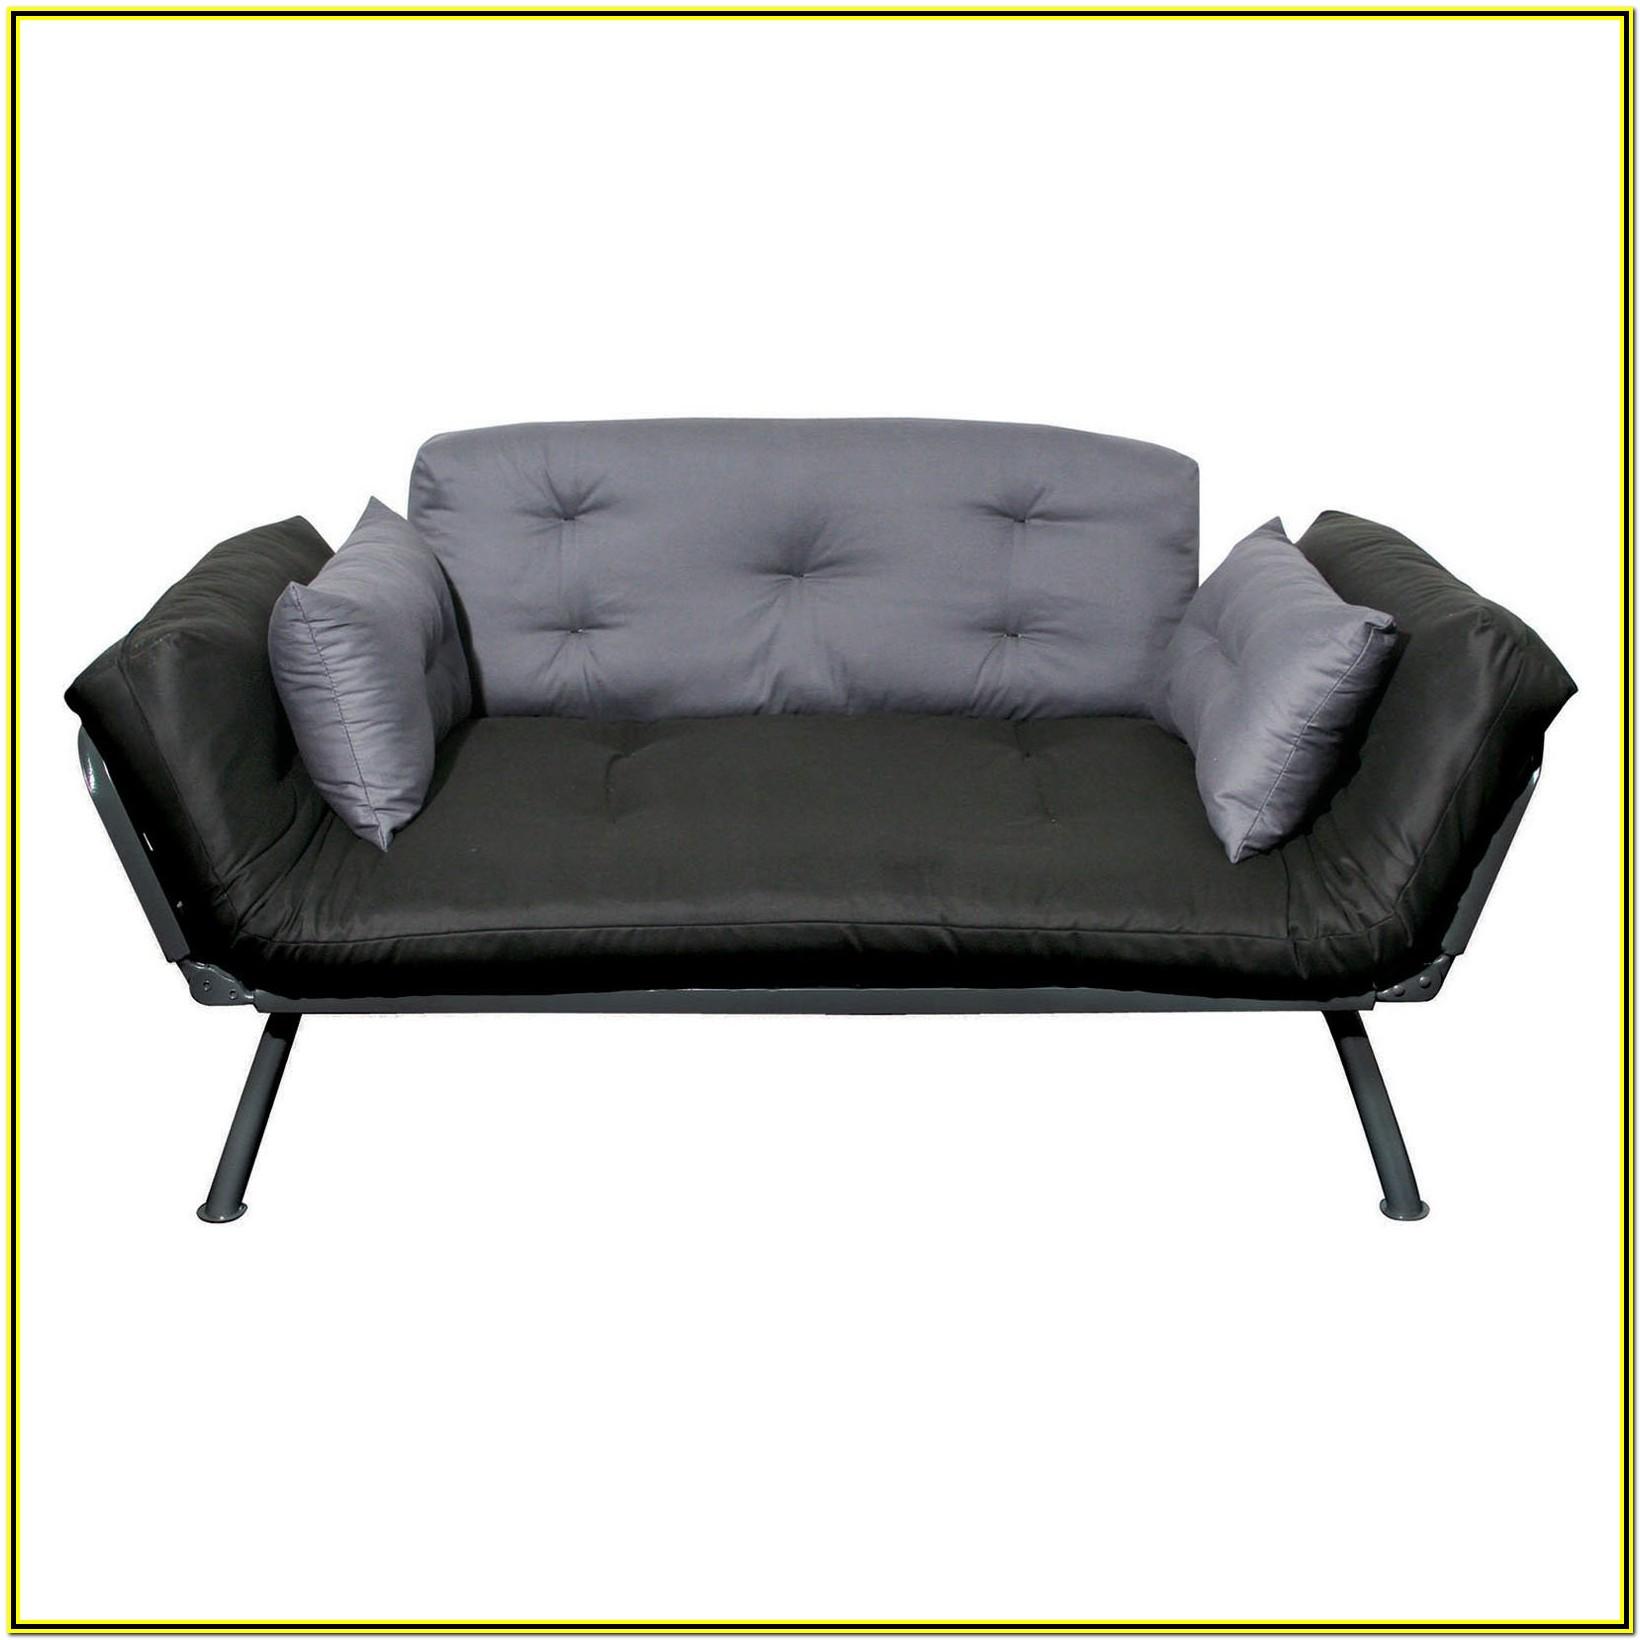 American Furniture Warehouse Sofa Beds